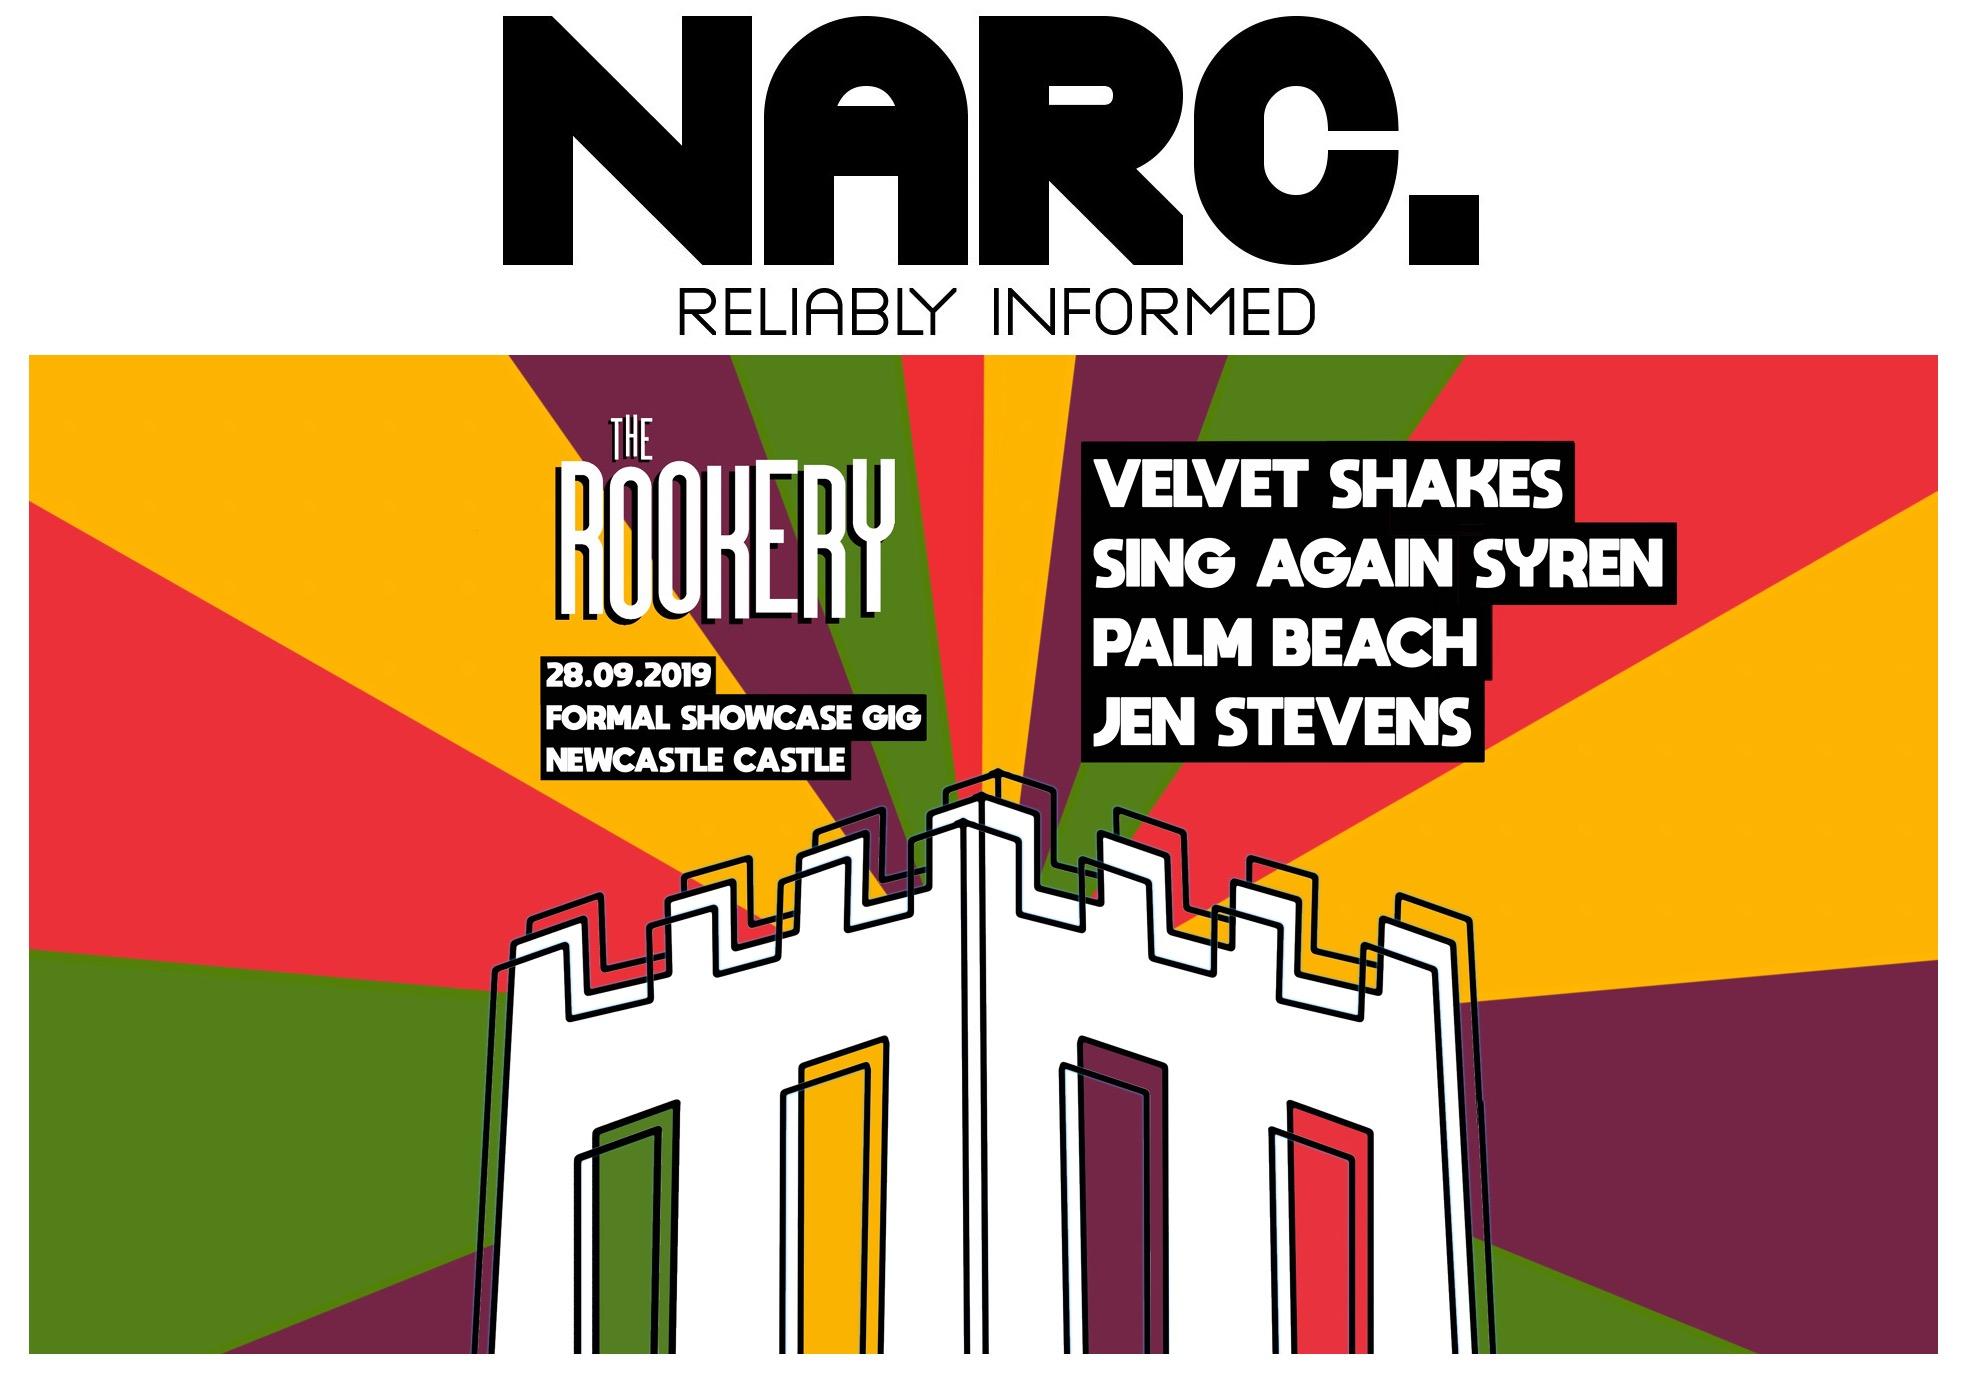 THE ROOKERY @ NEWCASTLE CASTLE - Narc Magazine